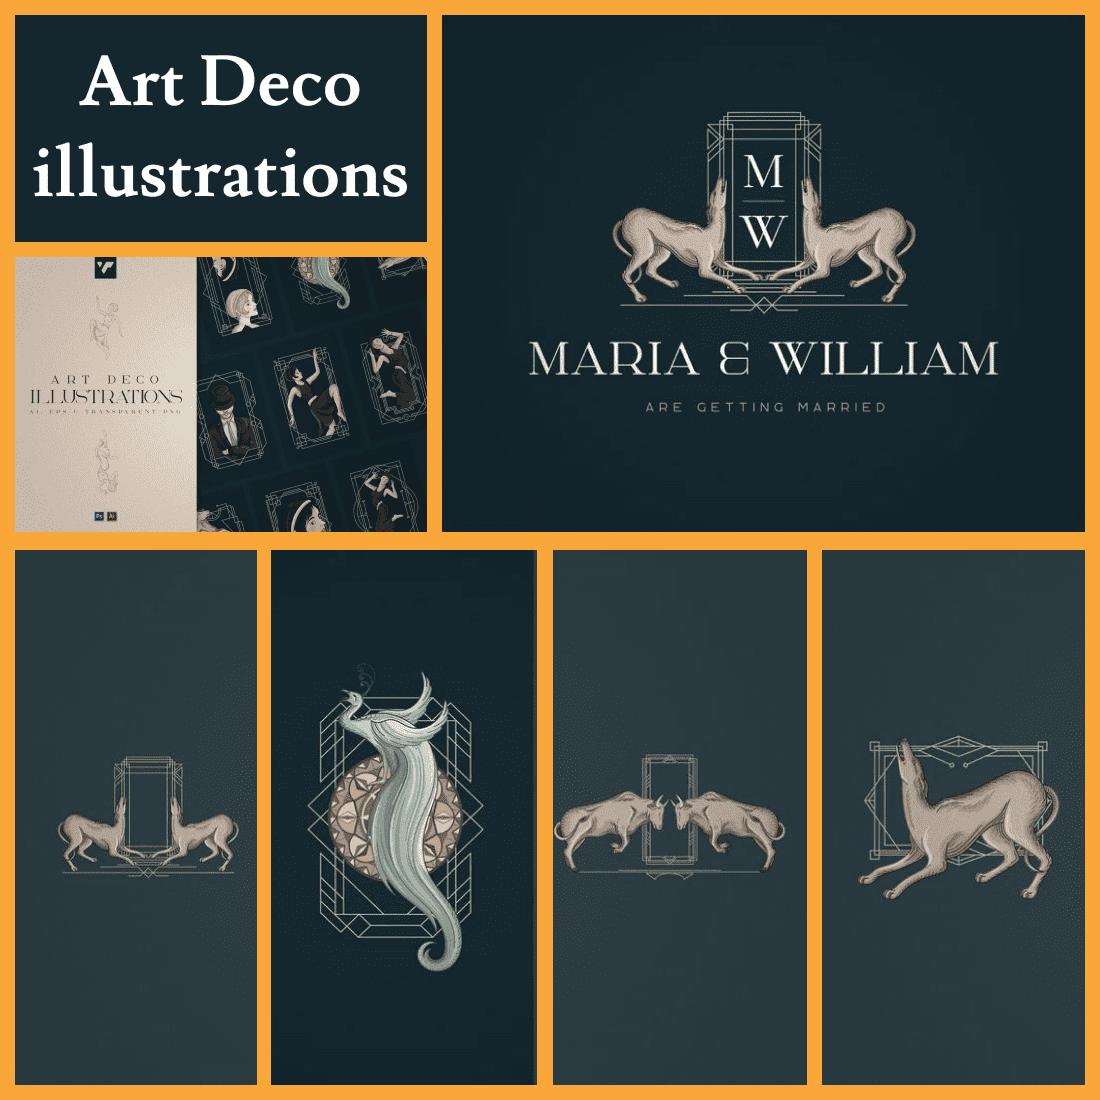 12 Art Deco illustrations